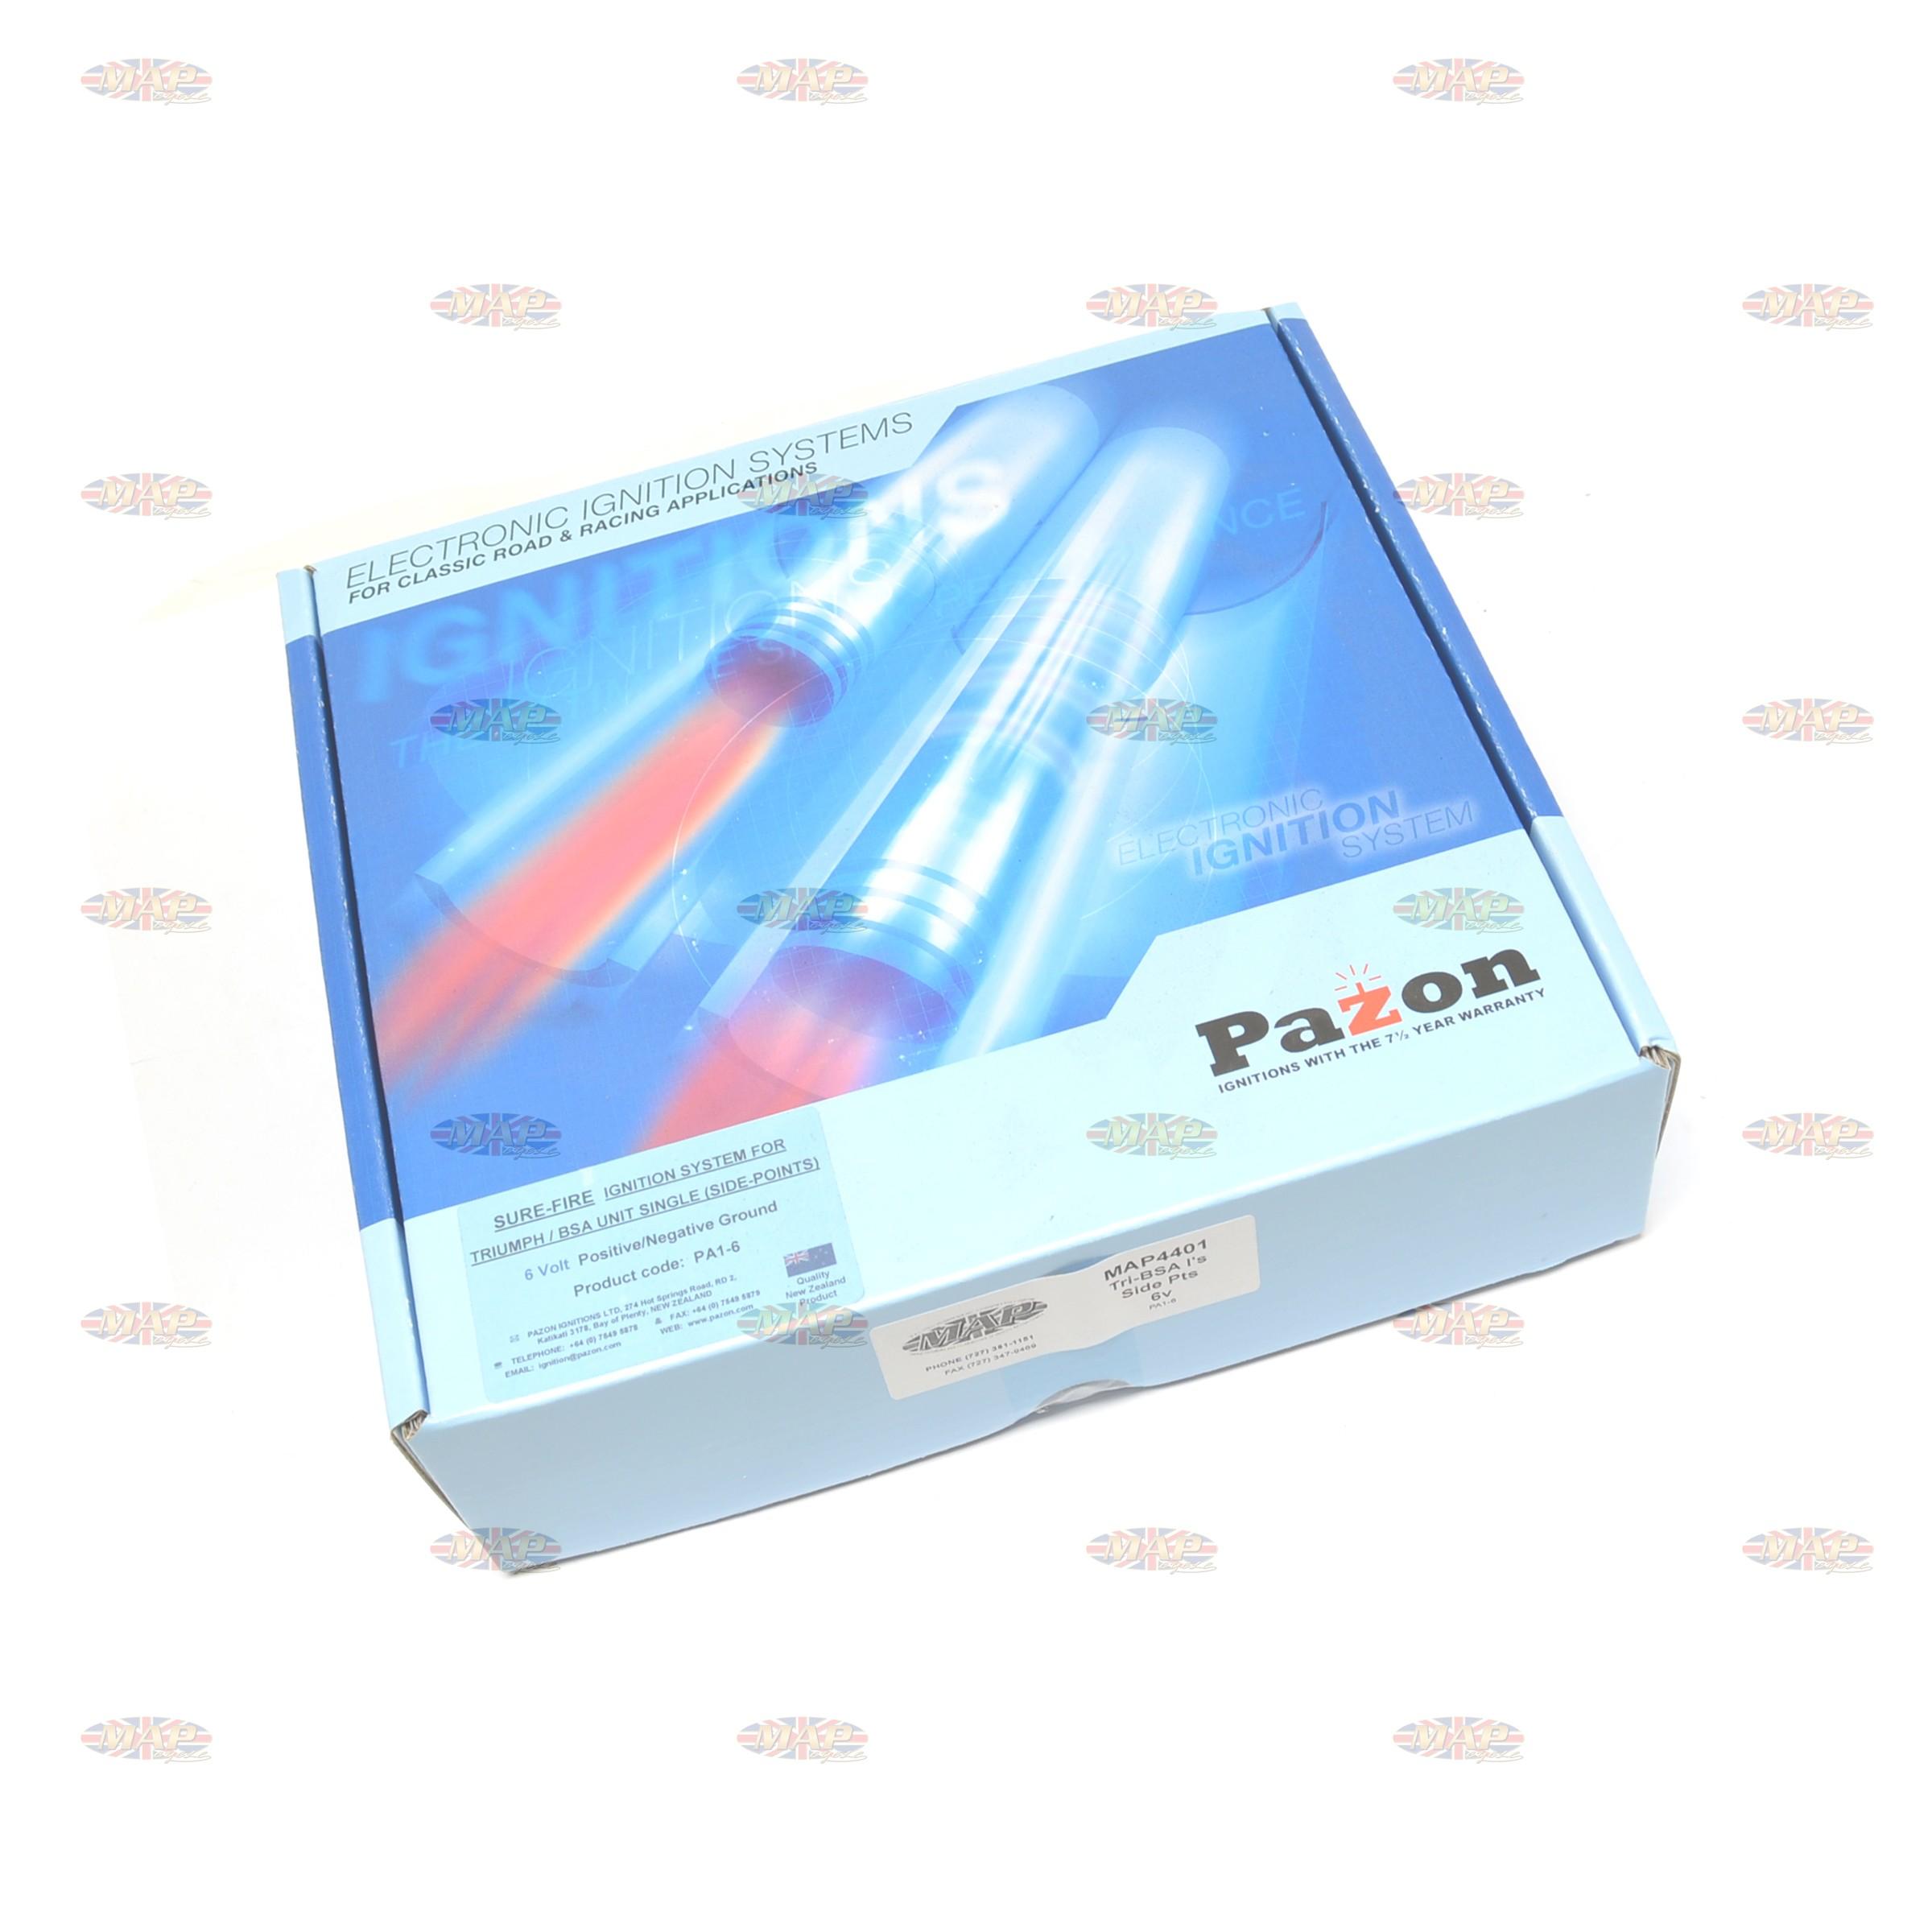 Positive Ground Wiring Diagram Pazon - House Wiring Diagram Symbols •